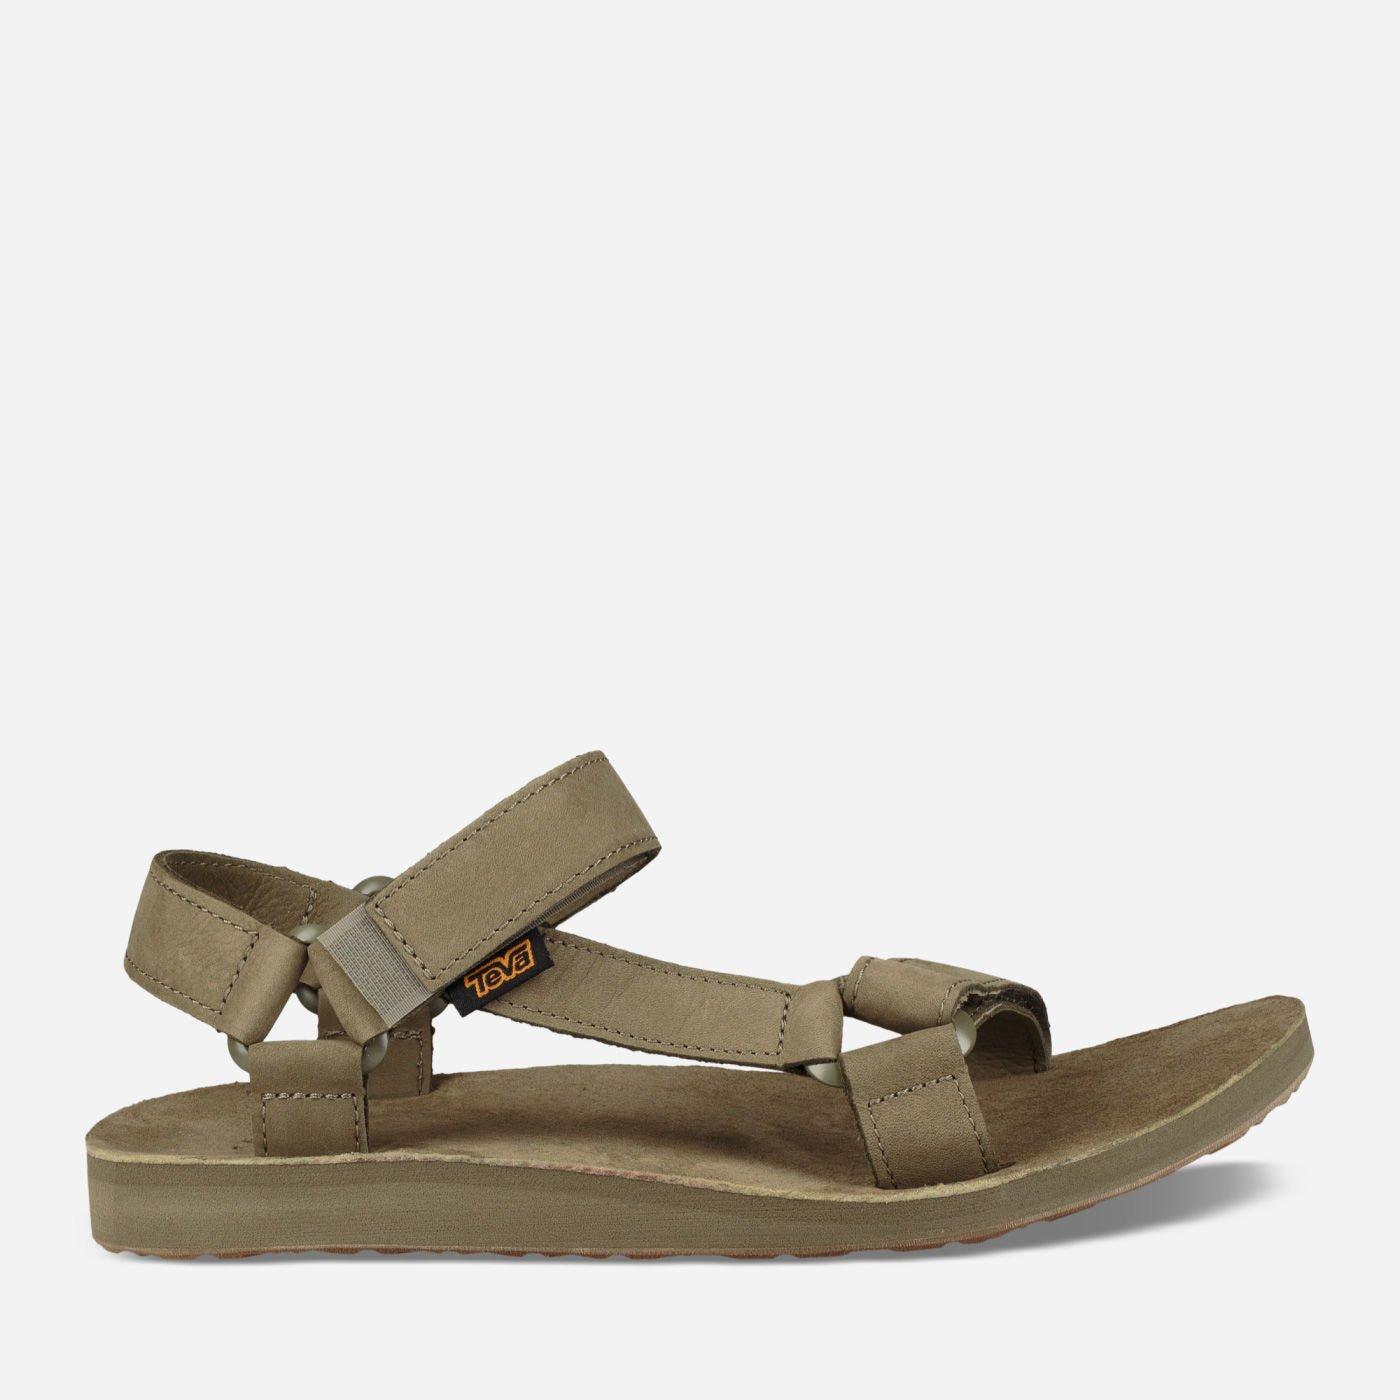 Shop Teva Men's Original Leather